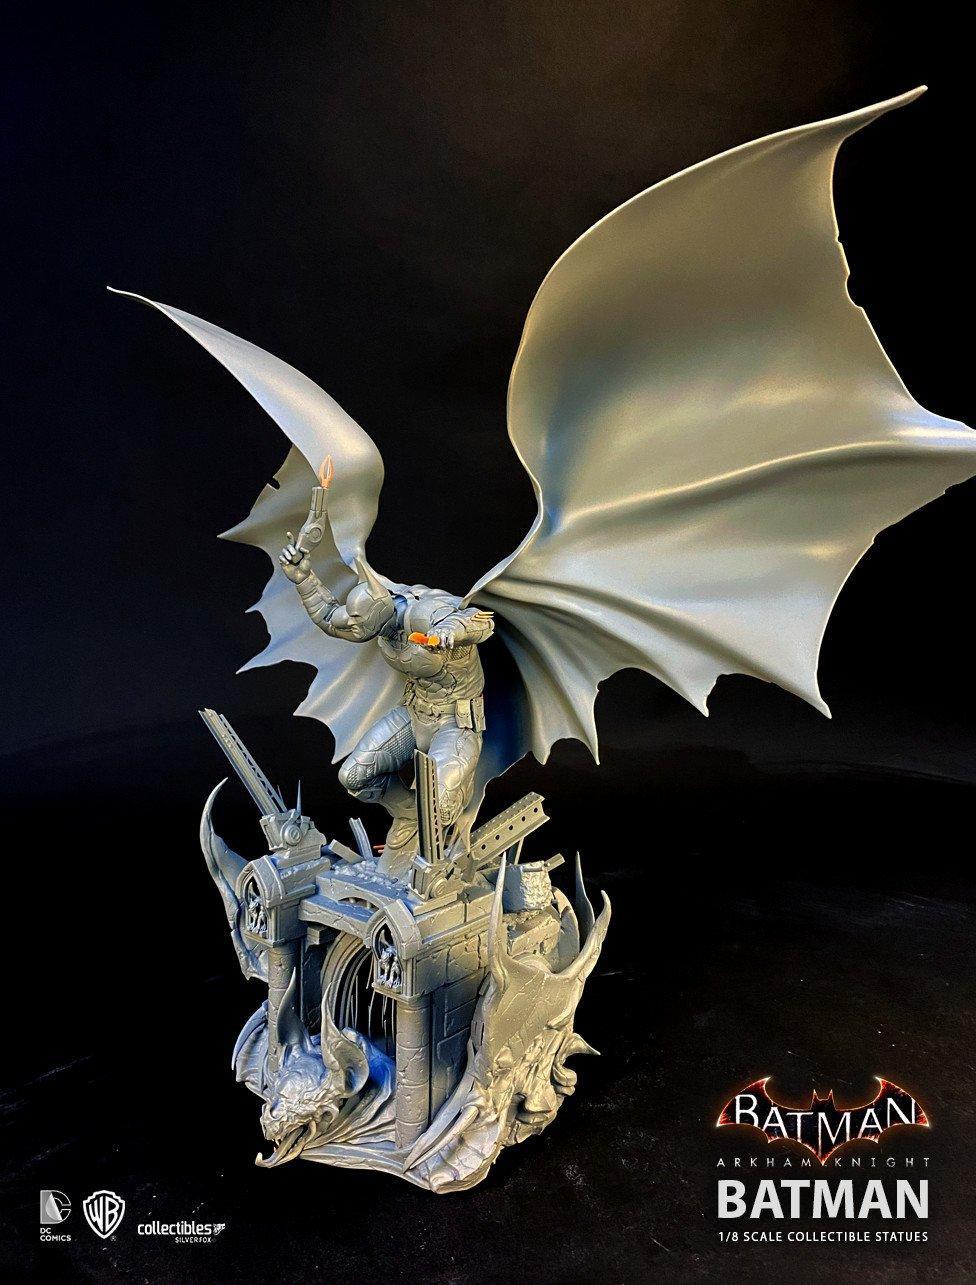 Batman siver fox collectibles batman arkham knight 1 8 scale statue10